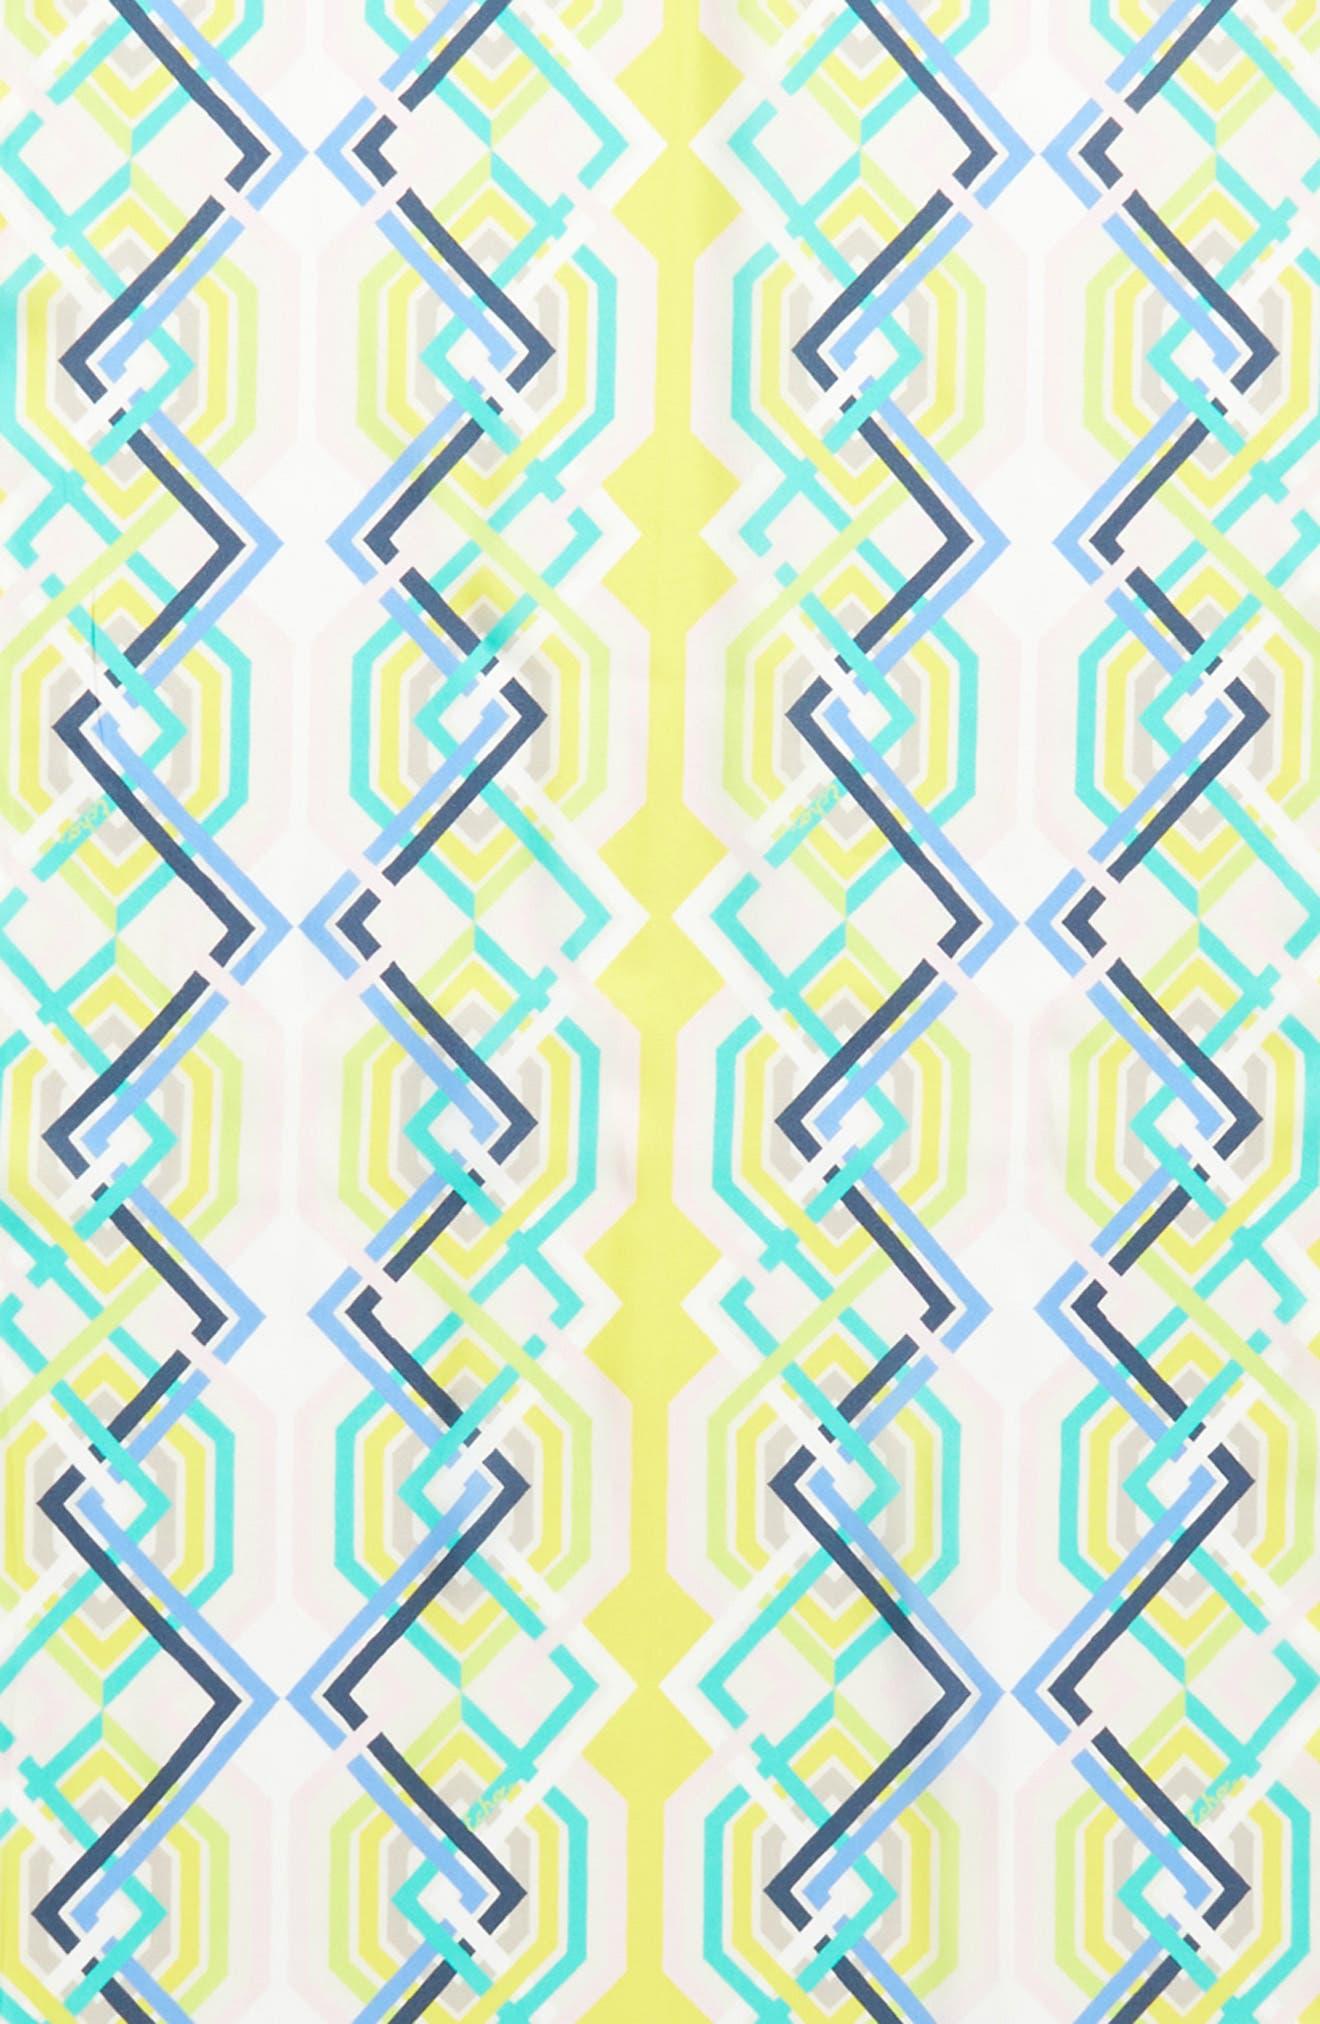 Geo Lattice Silk Scarf,                             Alternate thumbnail 4, color,                             Sunburst